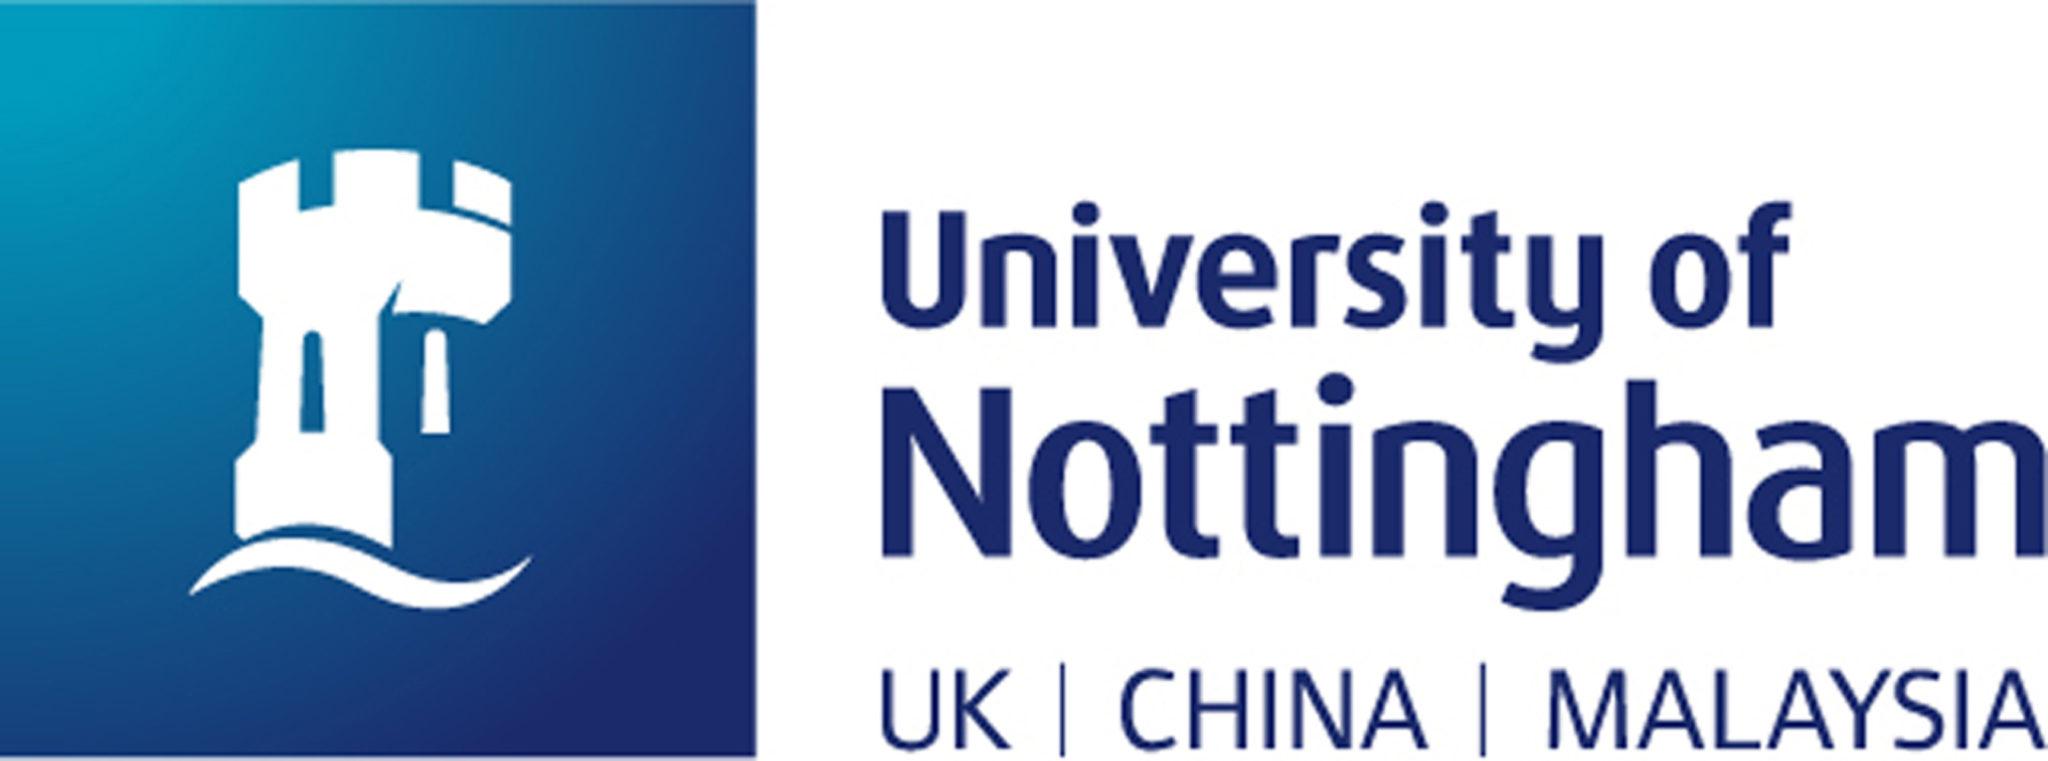 logo_University of Nottingham